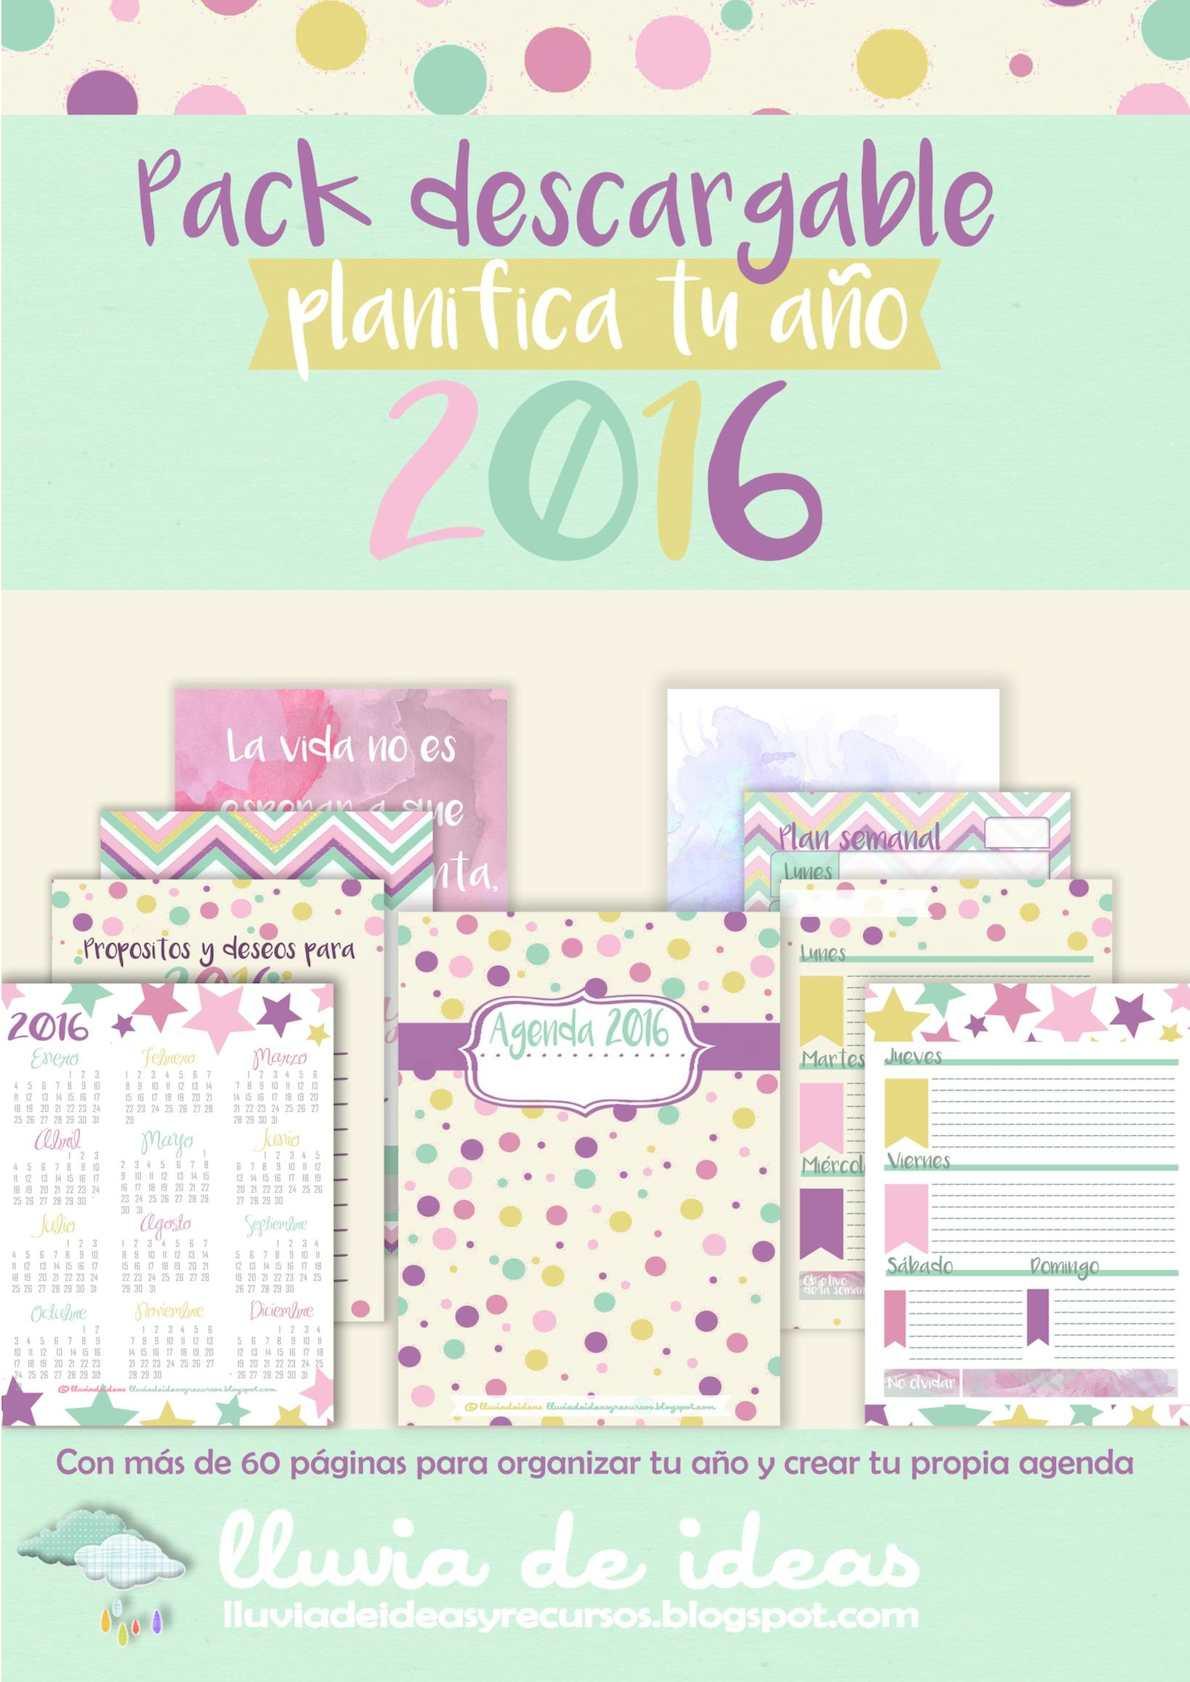 Pack Descargable planifica tu año 2016